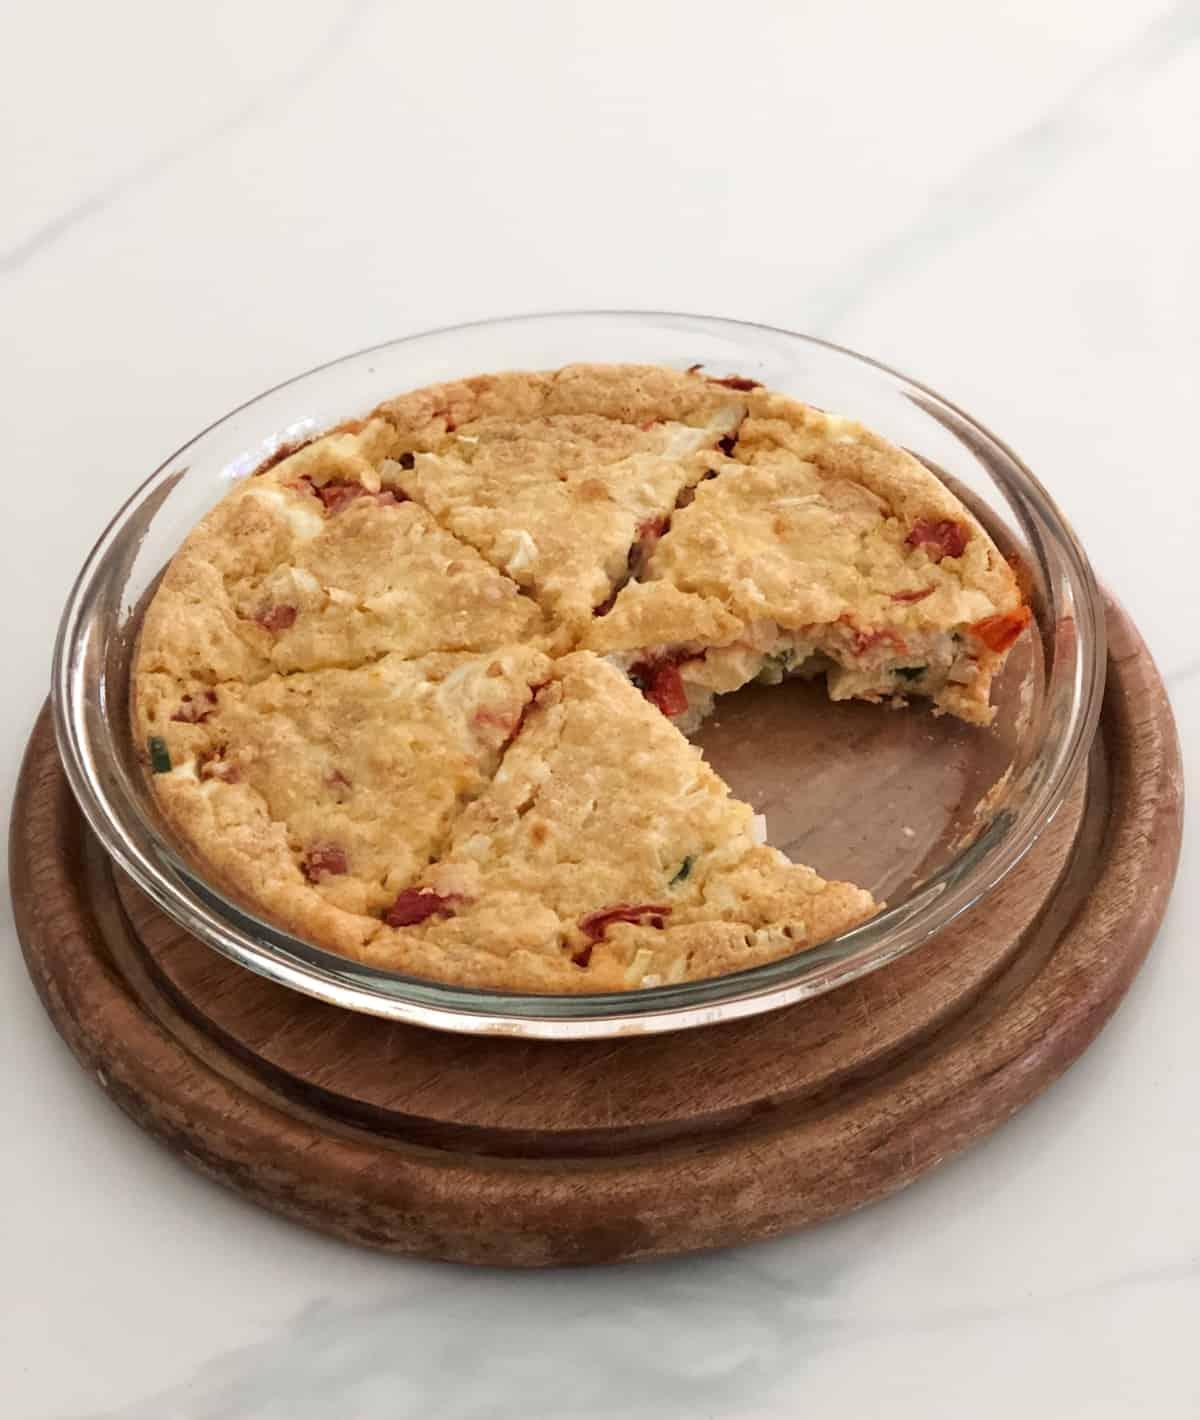 Zucchini pie in glass pie dish cut into six wedges.